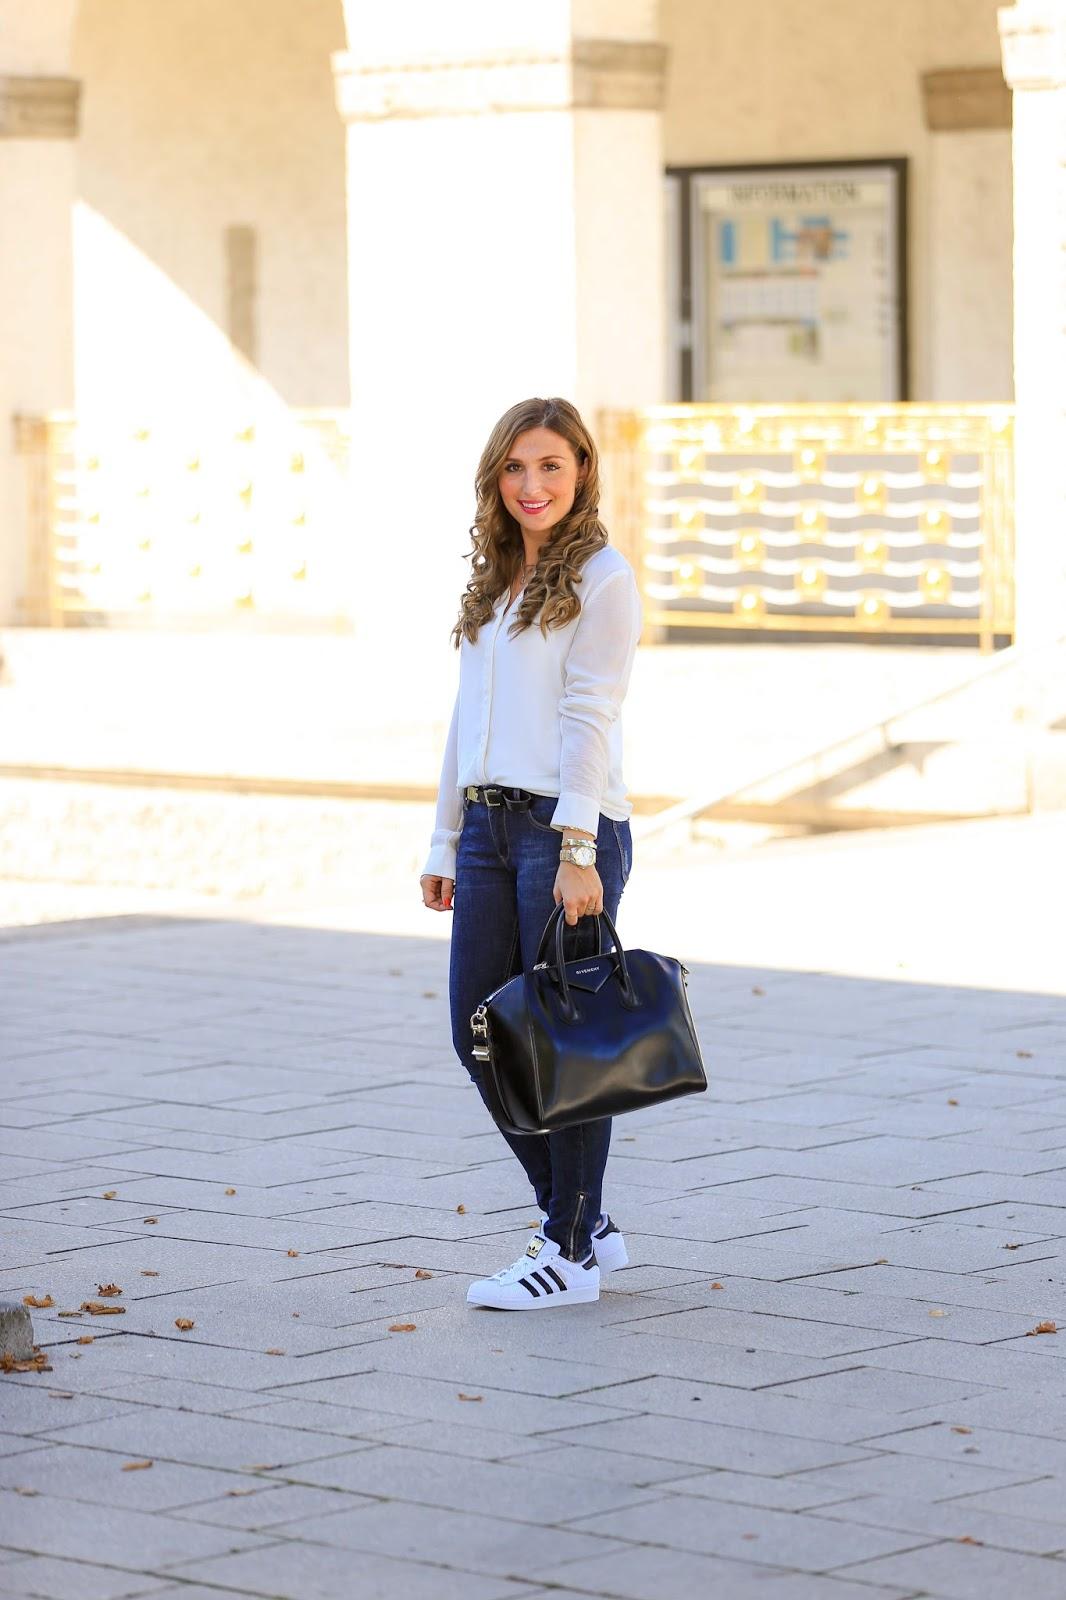 Casual Streetstyle-Streetstyle-adidas-stan smitsh-Fashionstylebyjohanna-Blogger-Fashionblog-Outfit-Modeblog-München-deutsche-Fashionblogger-Influencer-rosa-Givenchytasche